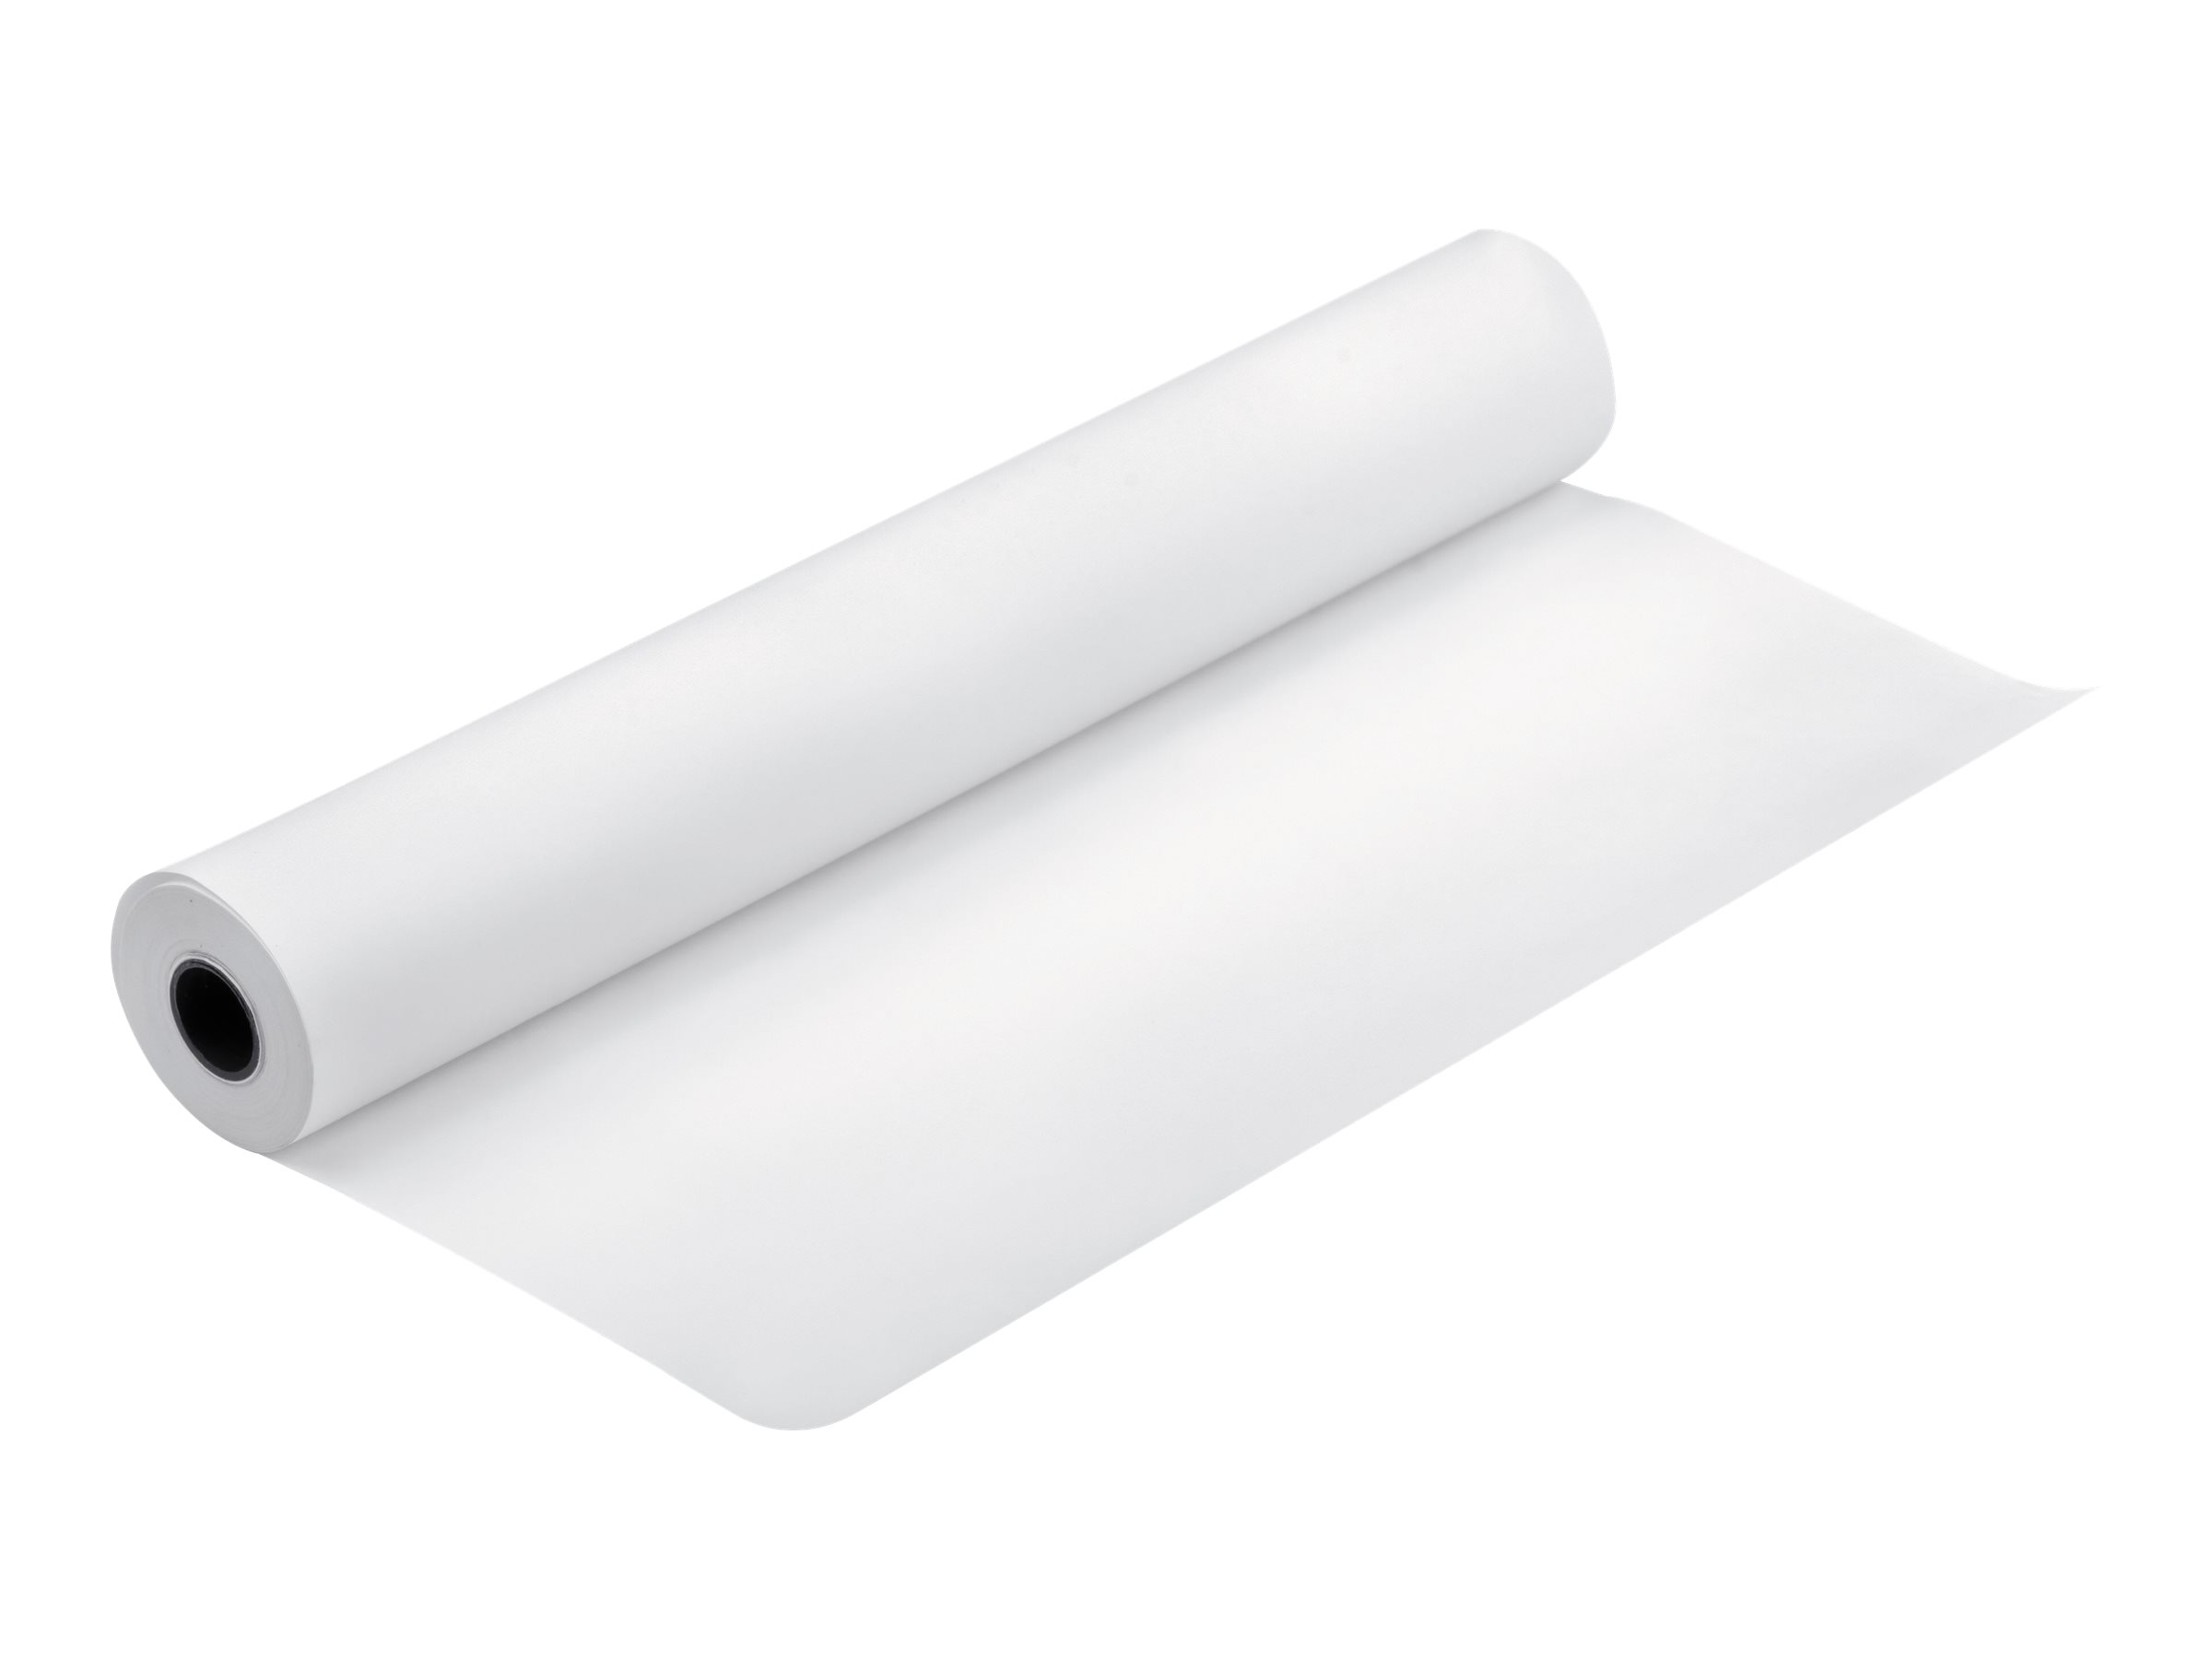 Epson Proofing Paper - Seidenmatt - harzbeschichtet - 9,9 mil - weiss - Rolle A1 (61,0 cm x 30,5 m)